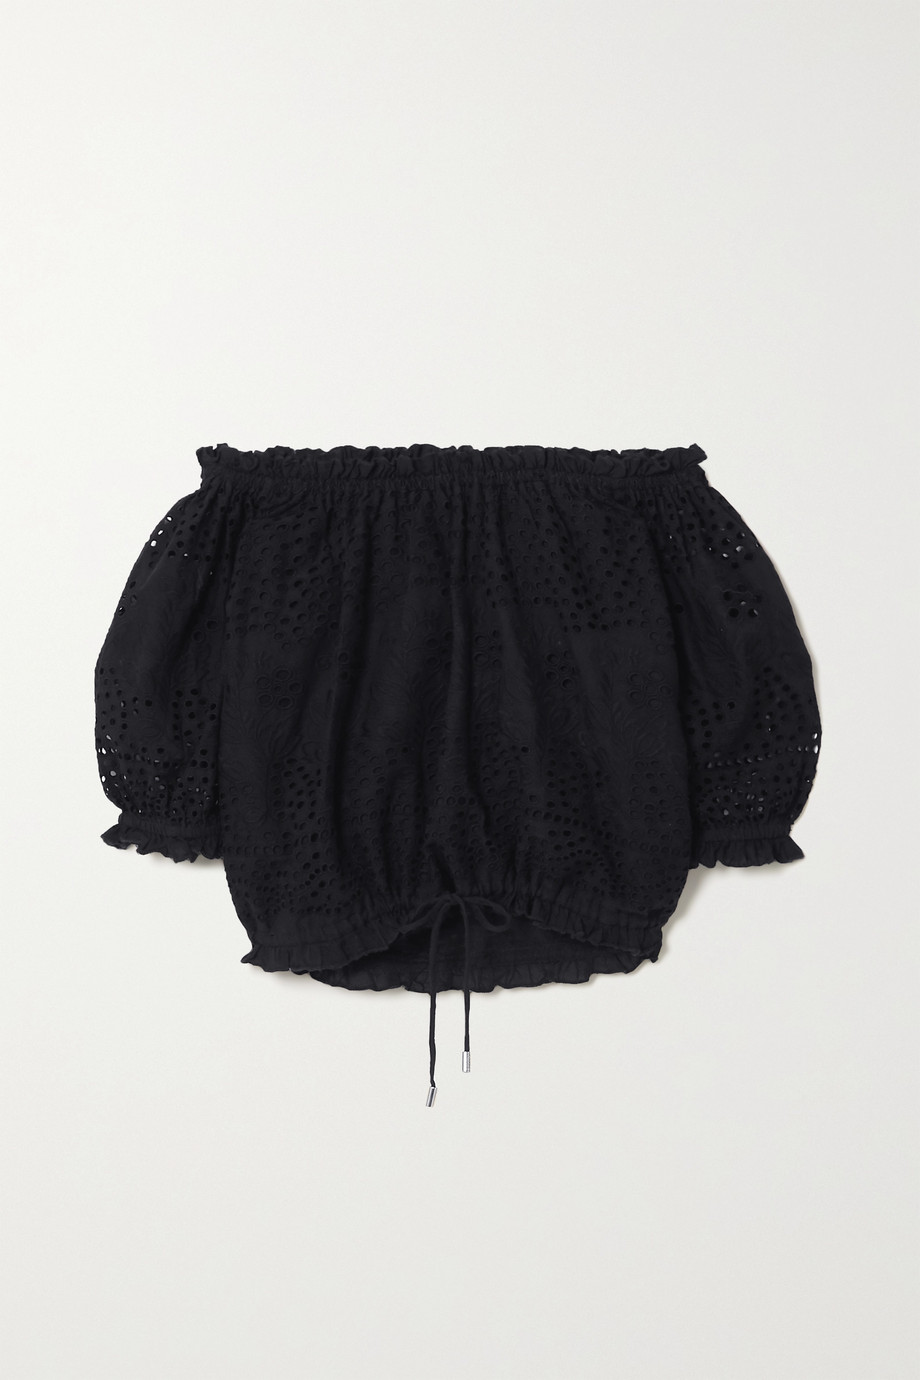 Melissa Odabash Francesca cropped off-the-shoulder broderie anglaise cotton top